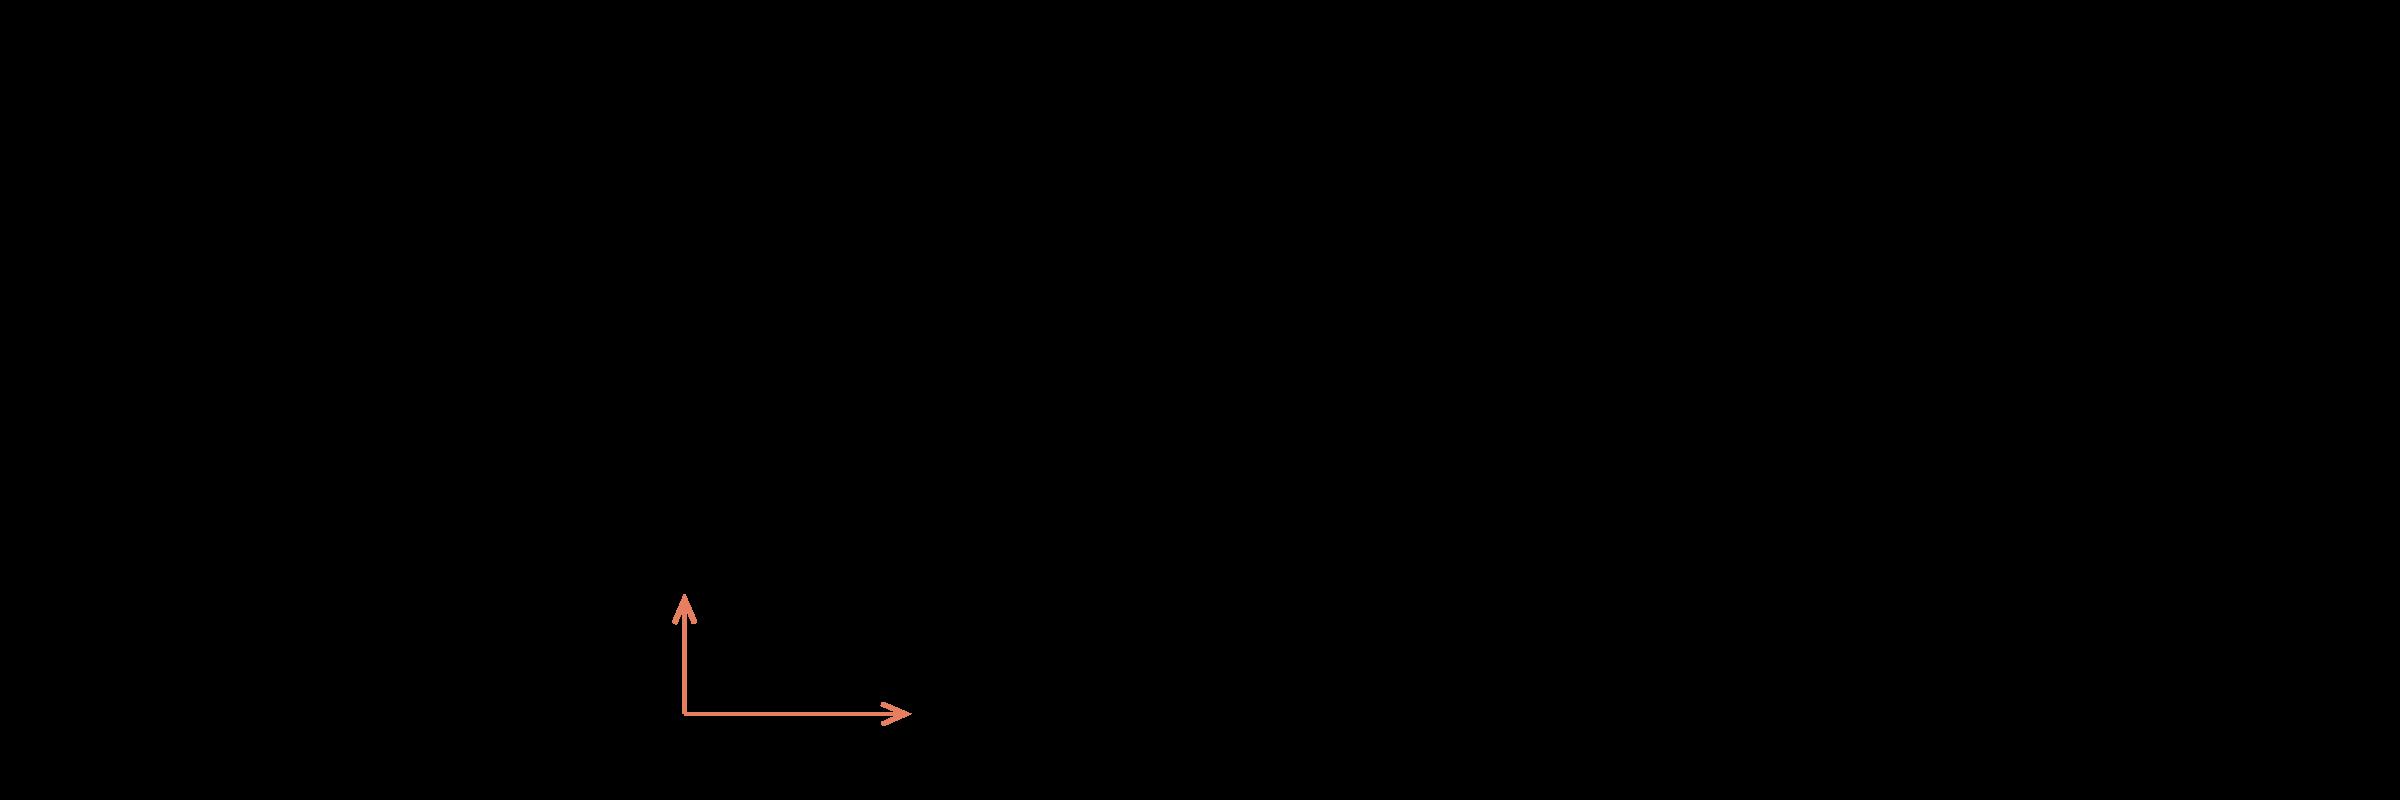 animation-part